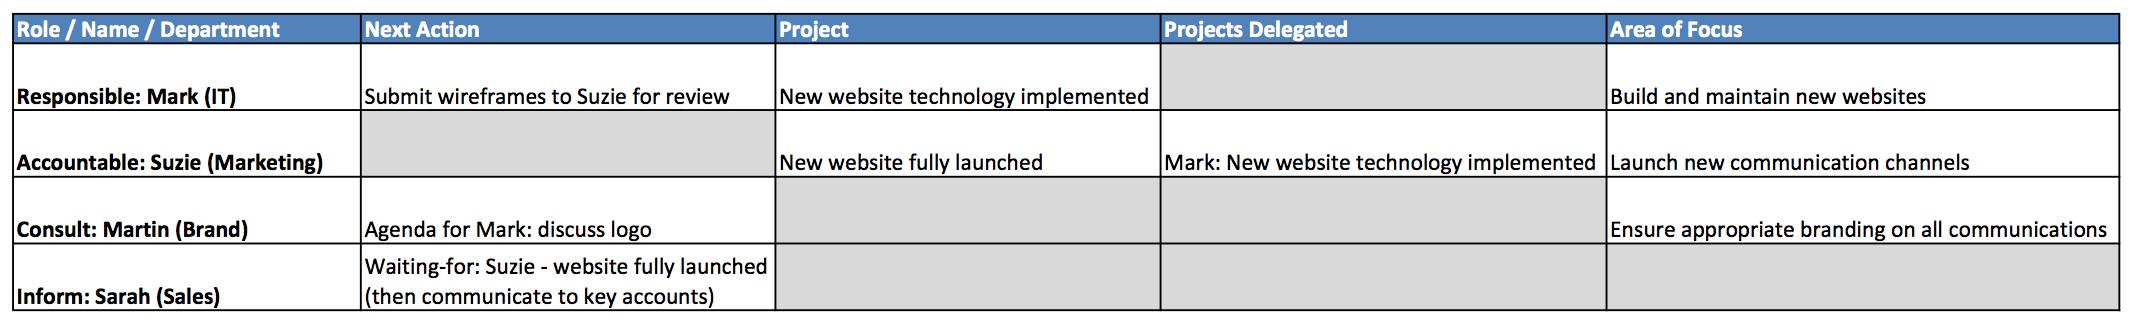 Sample RACI Roles Table